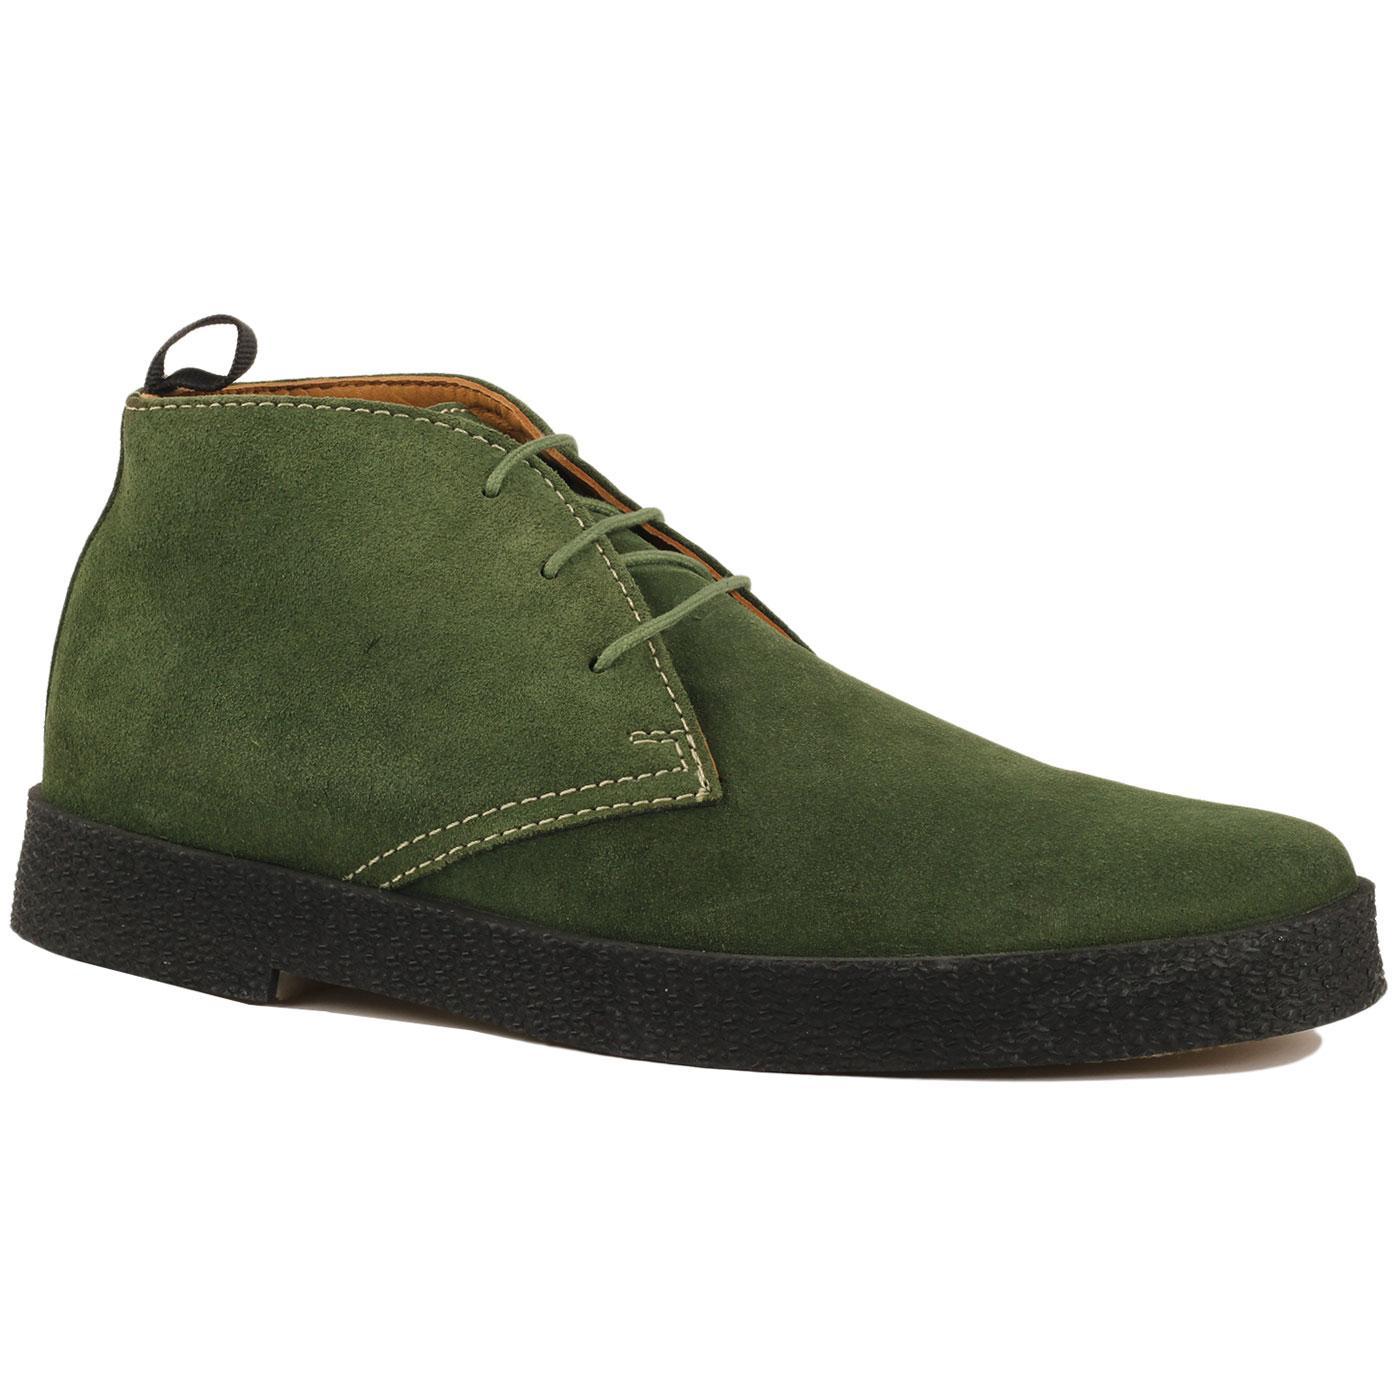 Madcap England Cisco Men's 60s Mod Suede Playboy Desert Boots in Green Suede